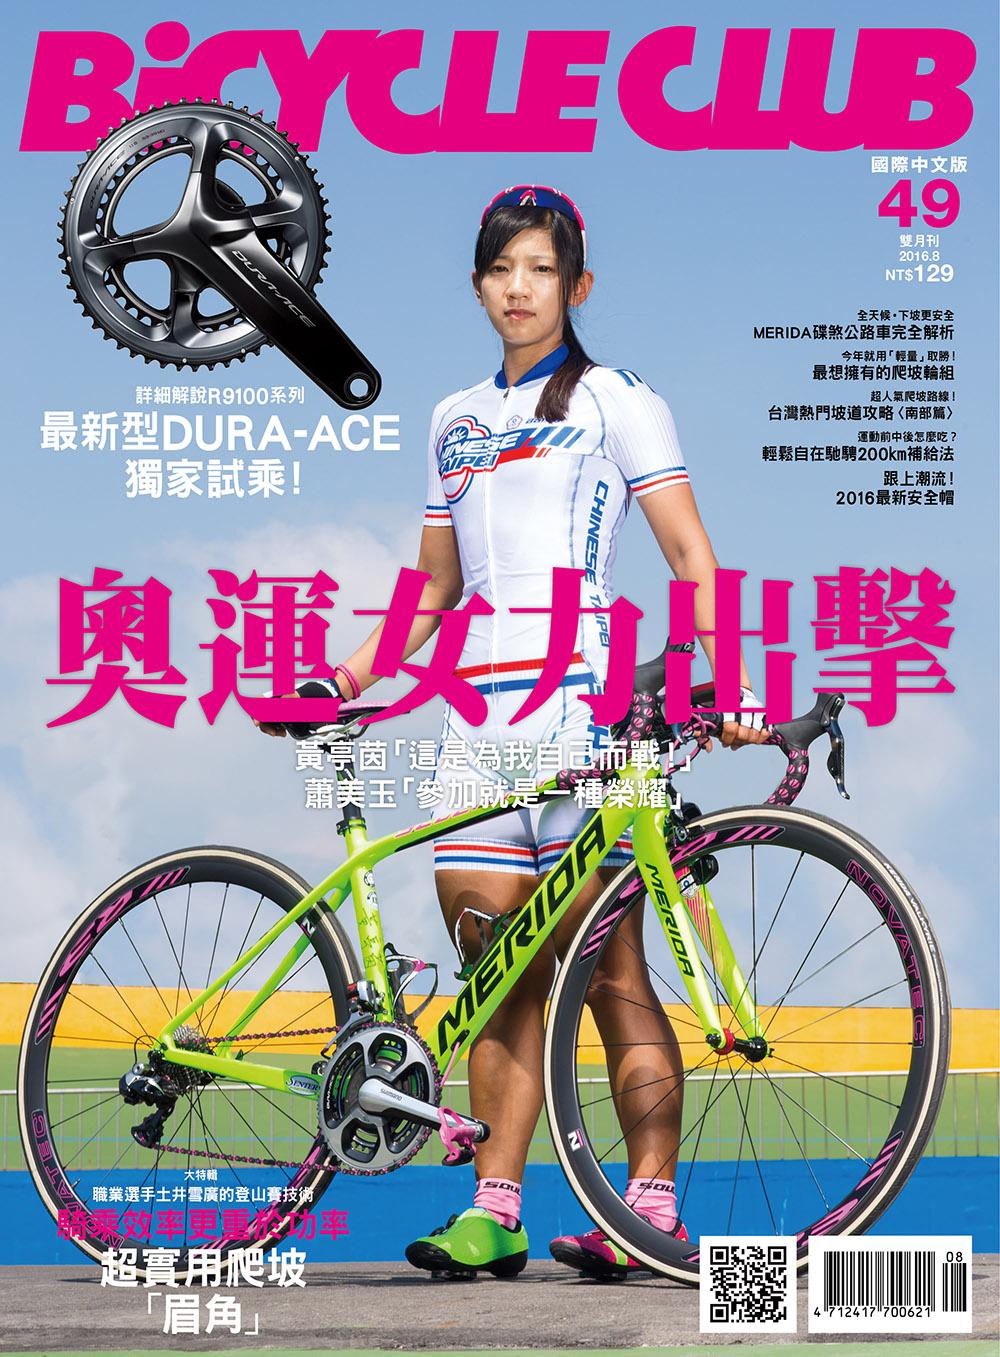 bicycle club單車俱樂部 8月號 2016 第49期